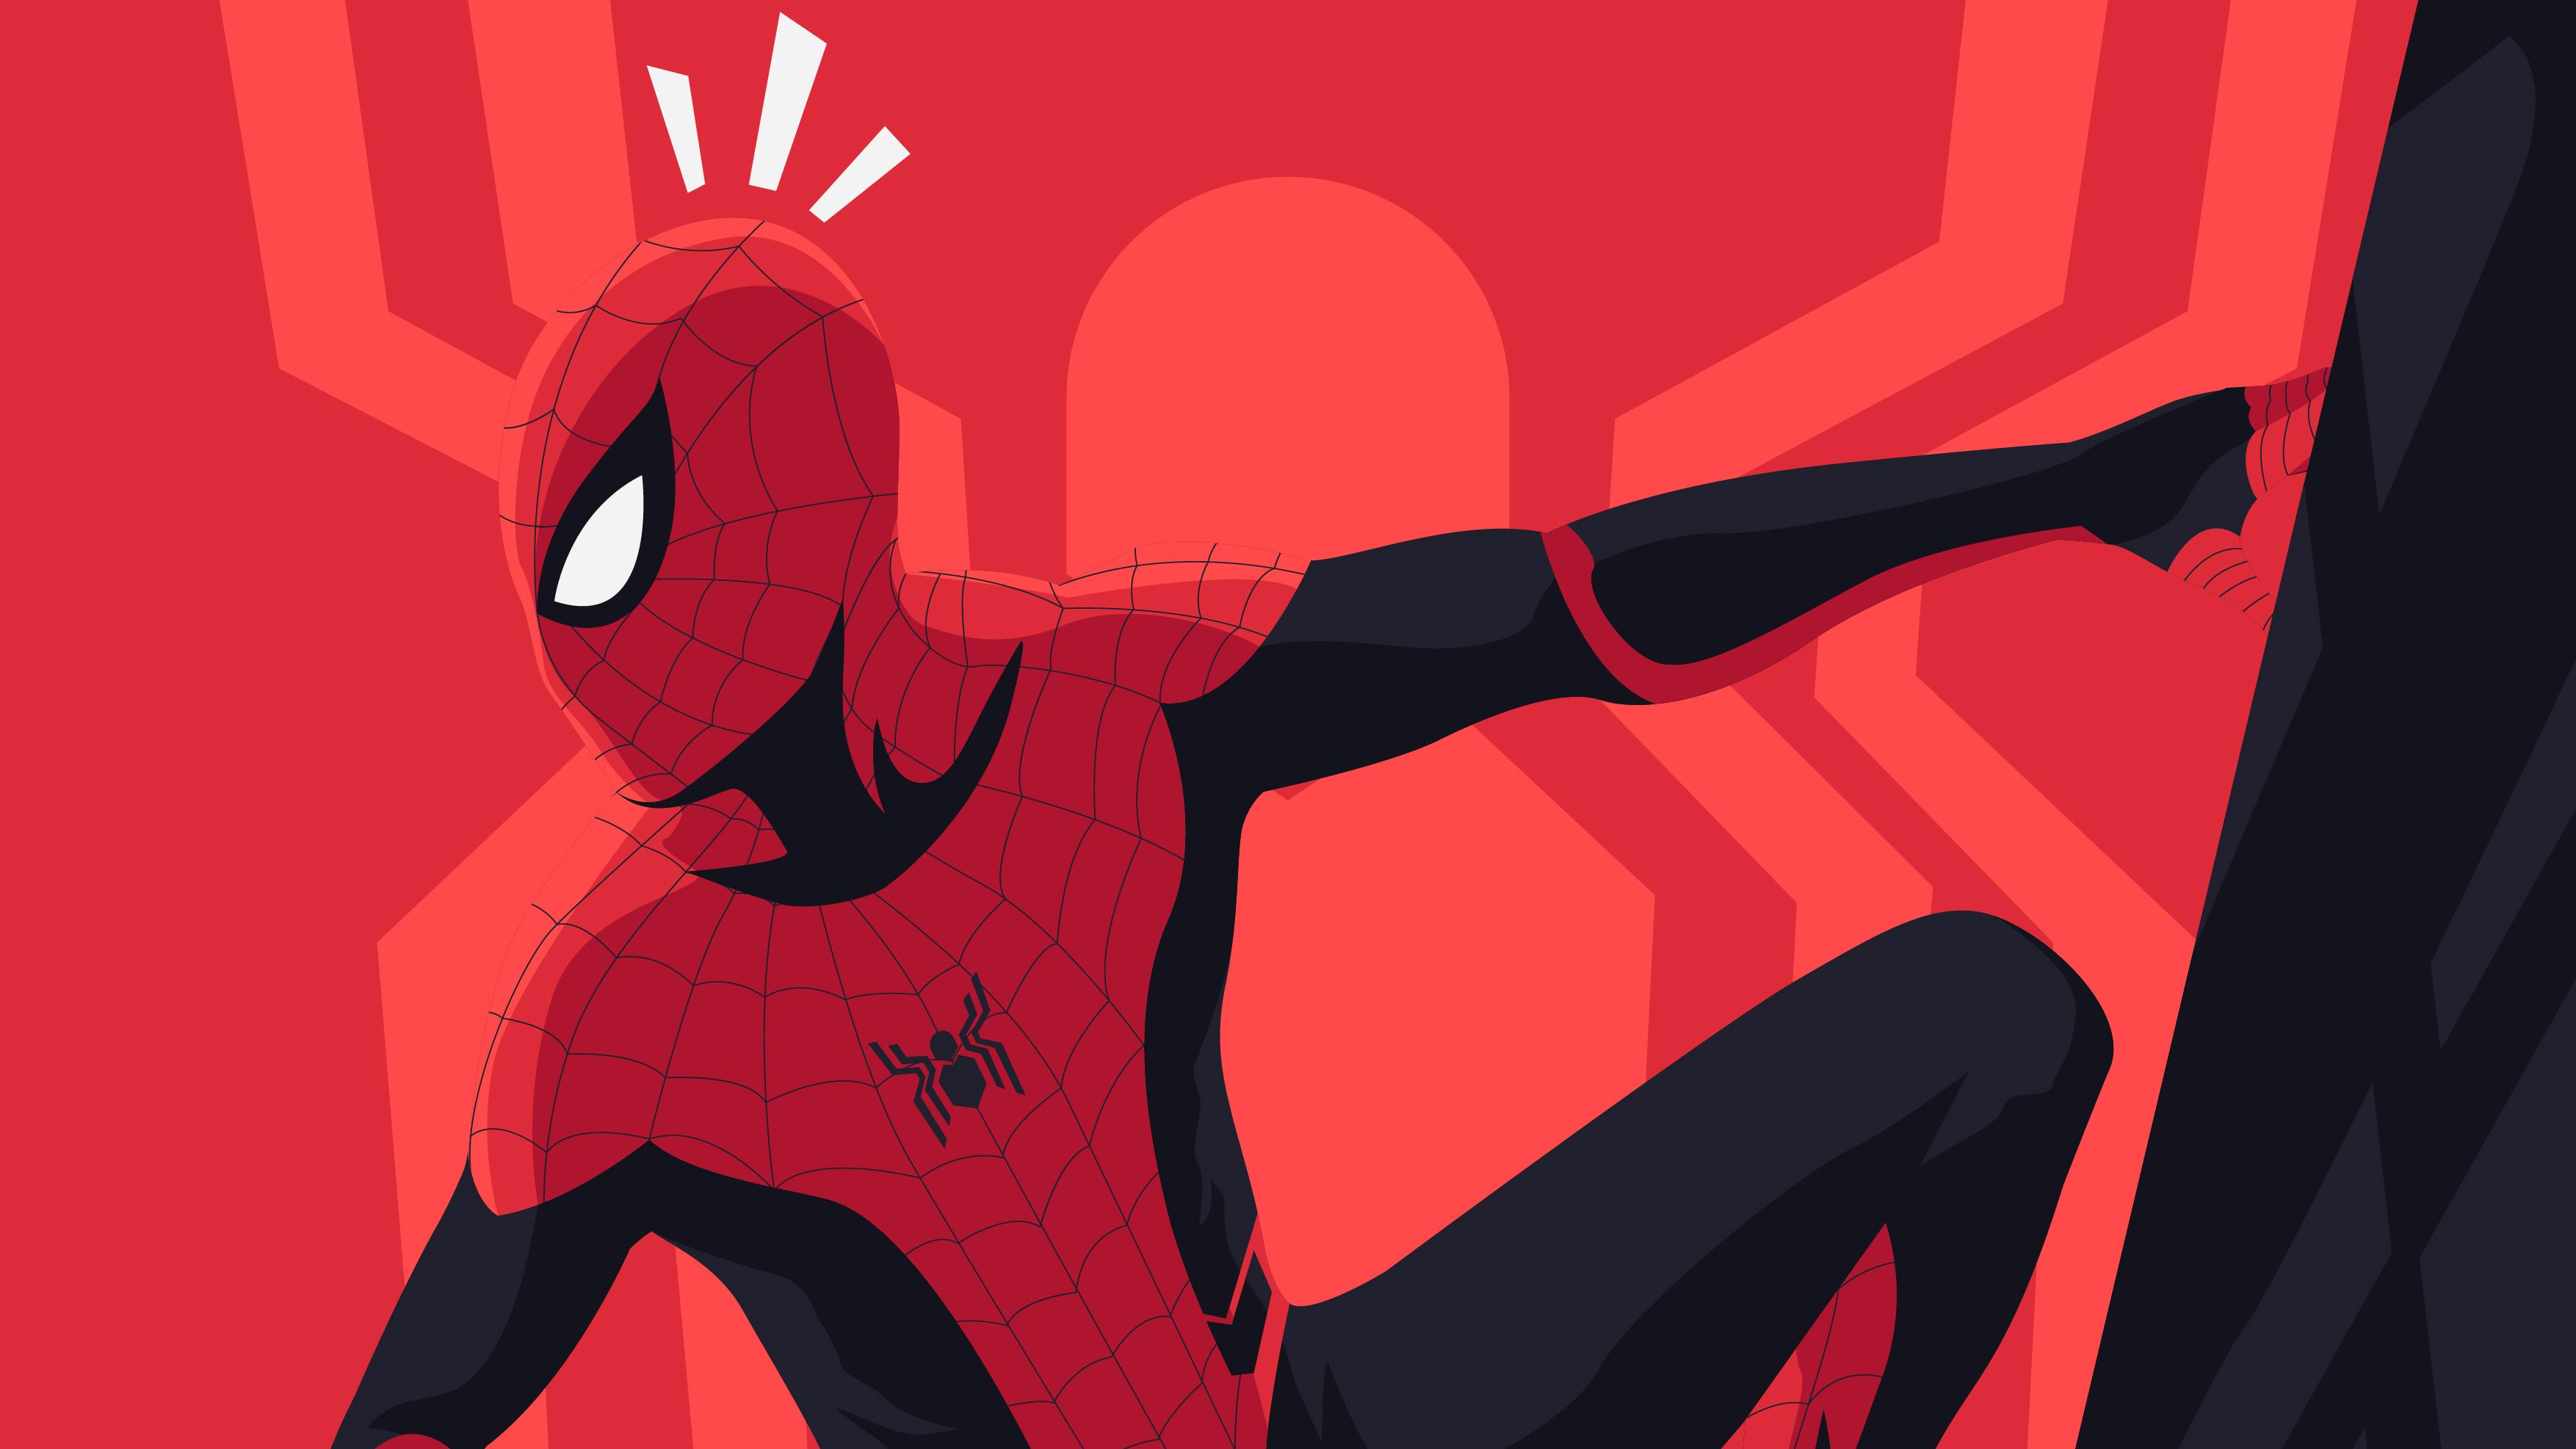 2048x2048 Spiderman Far From Home Movie Art Ipad Air Hd 4k